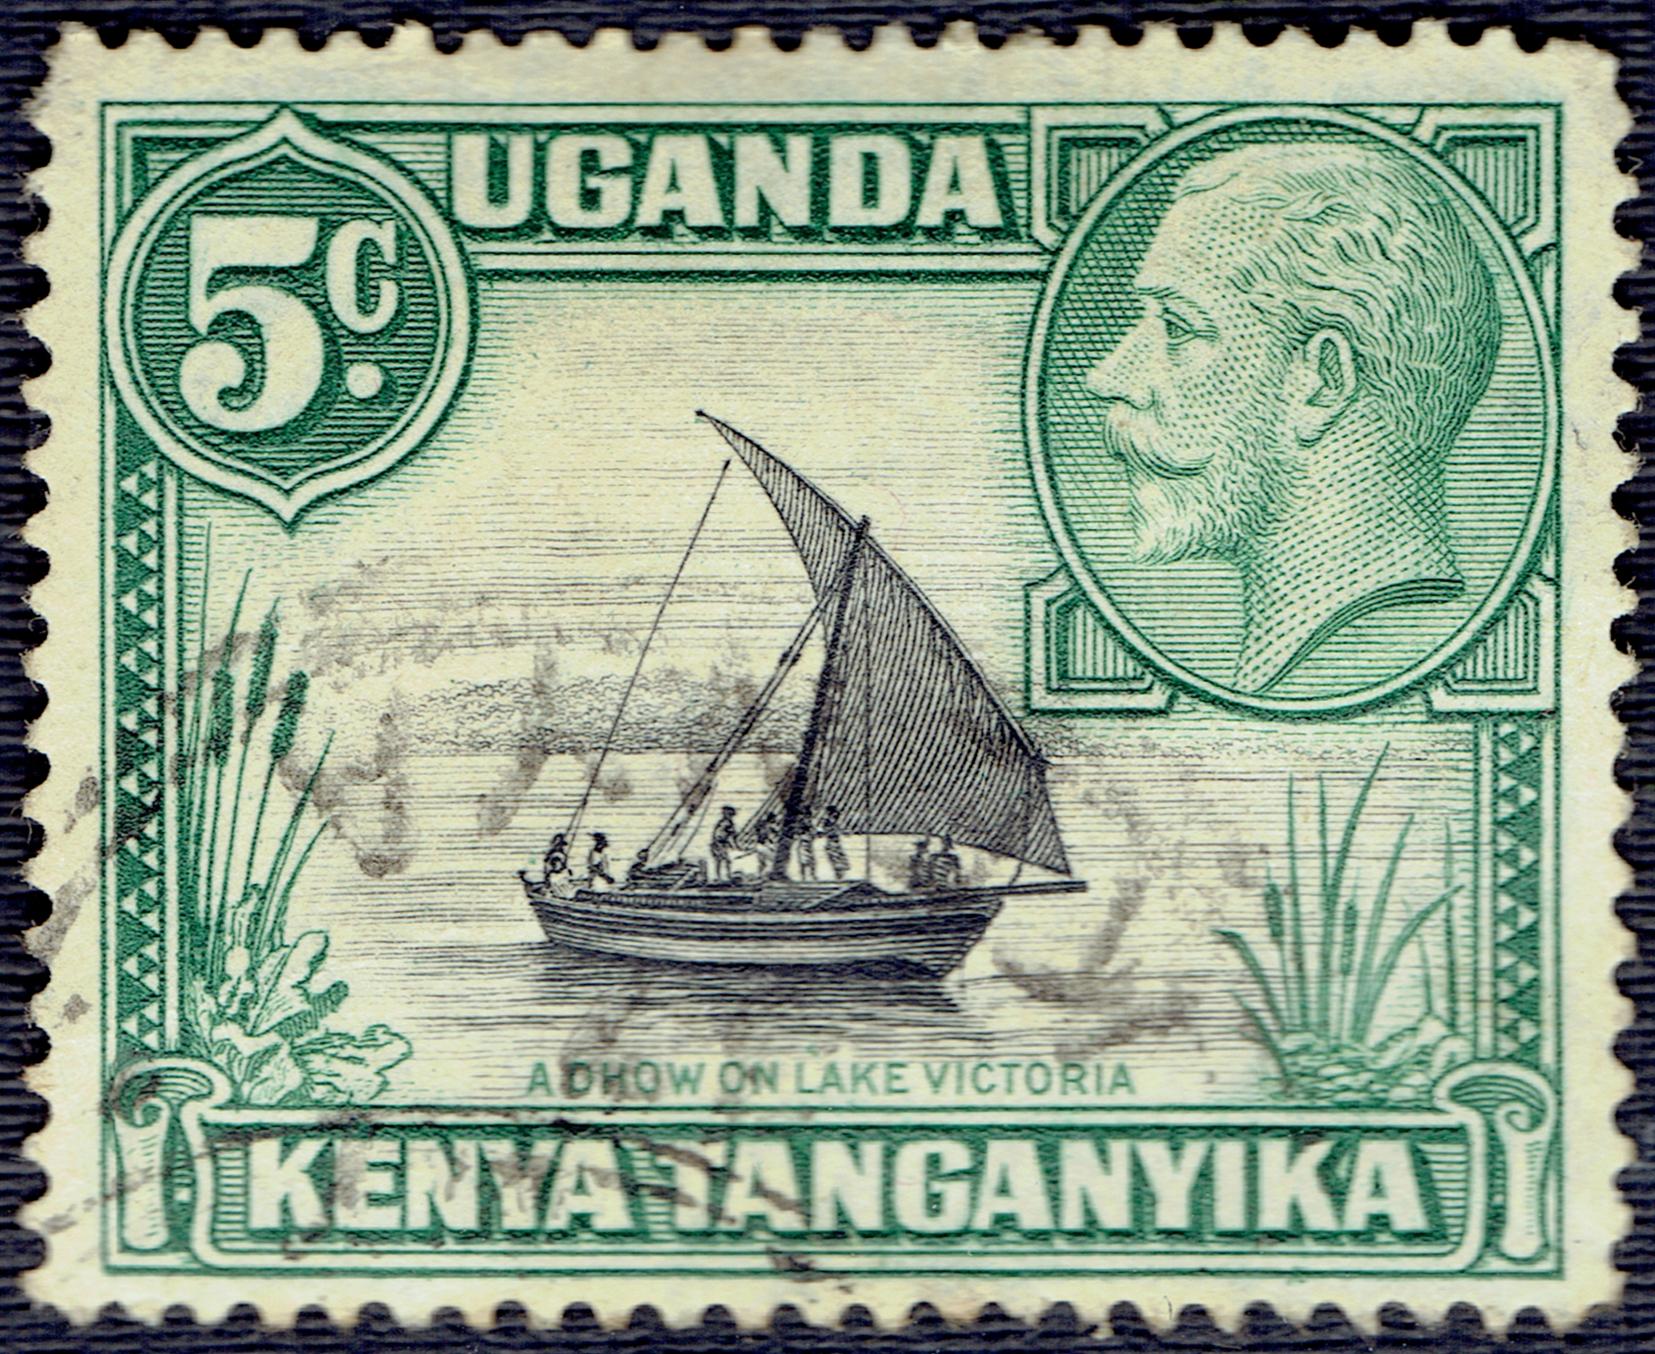 Kenya, Uganda, Tanganyika - Scott #47 (1935)